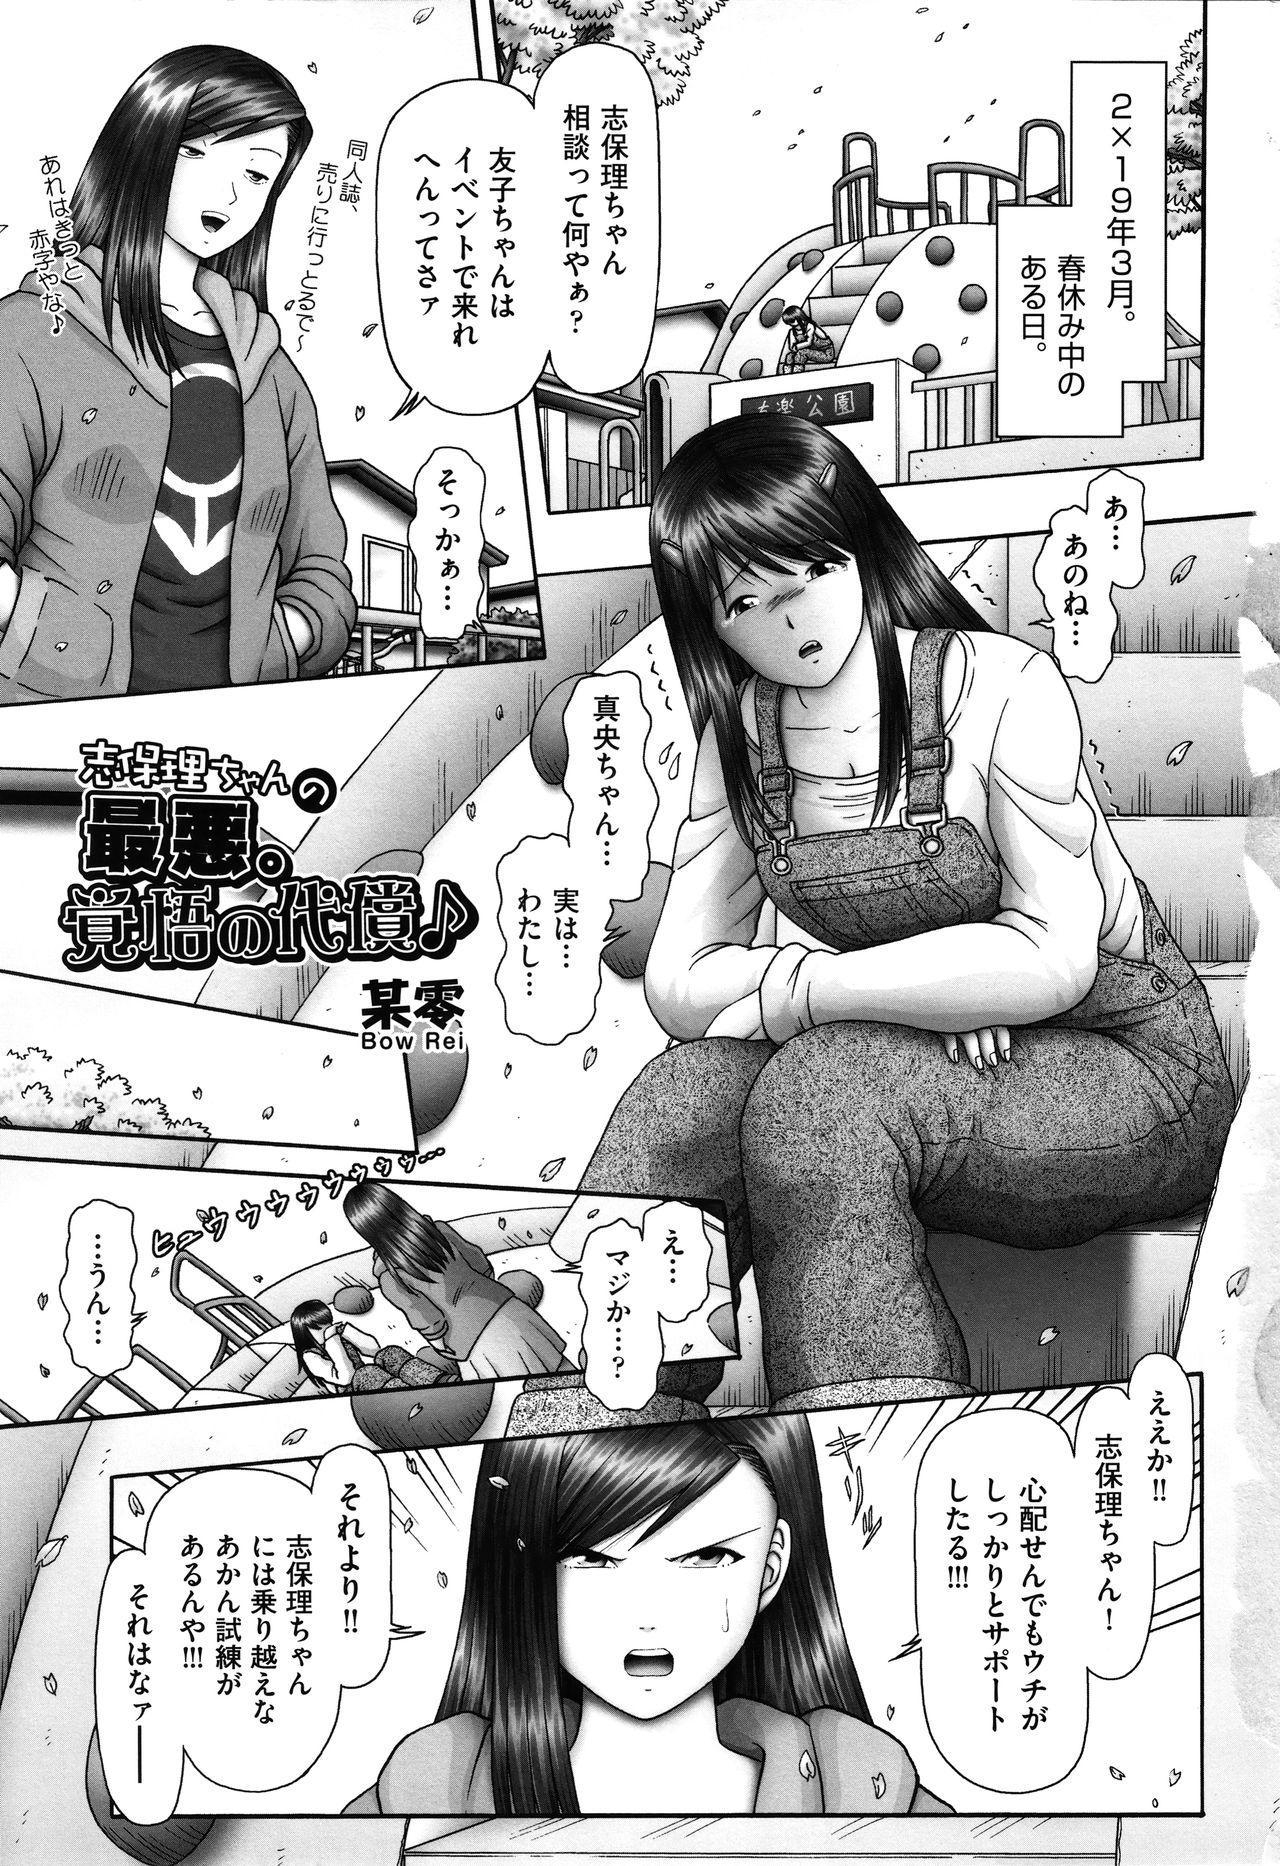 Shoujo Kumikyoku 17 3